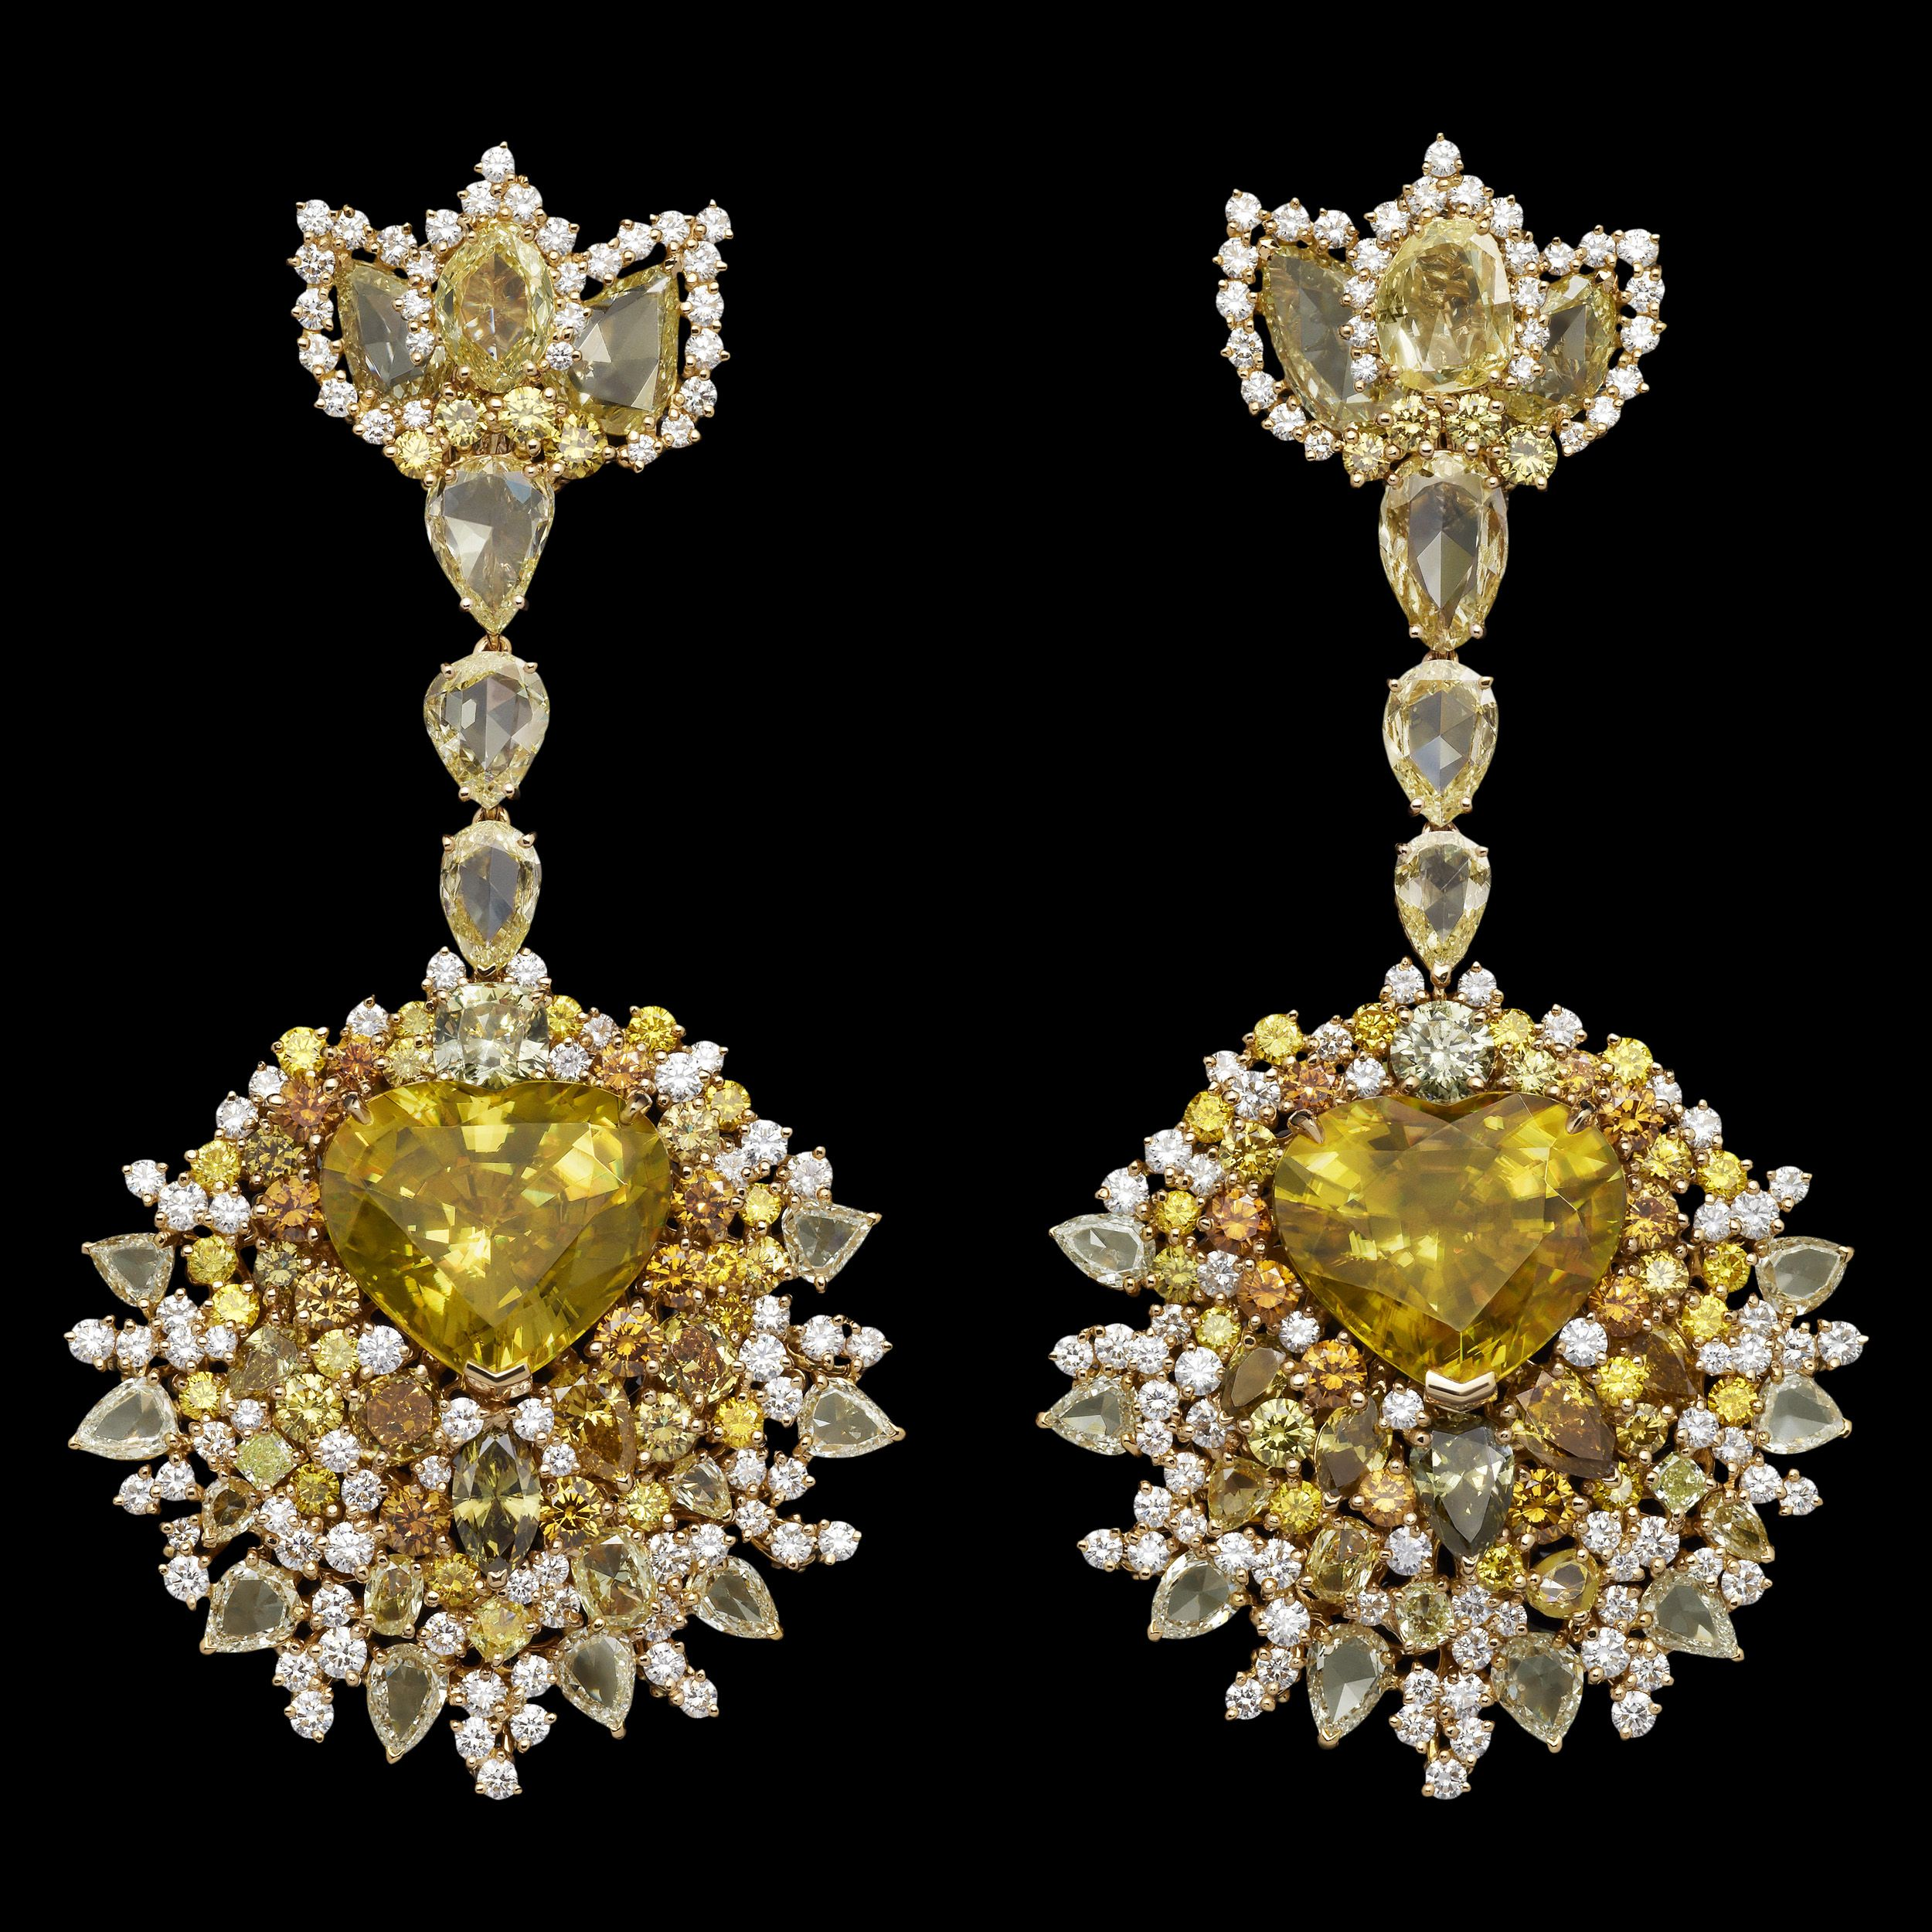 Dior Jewellery Dear Dior Dentelle Mdaillon Soleil earrings